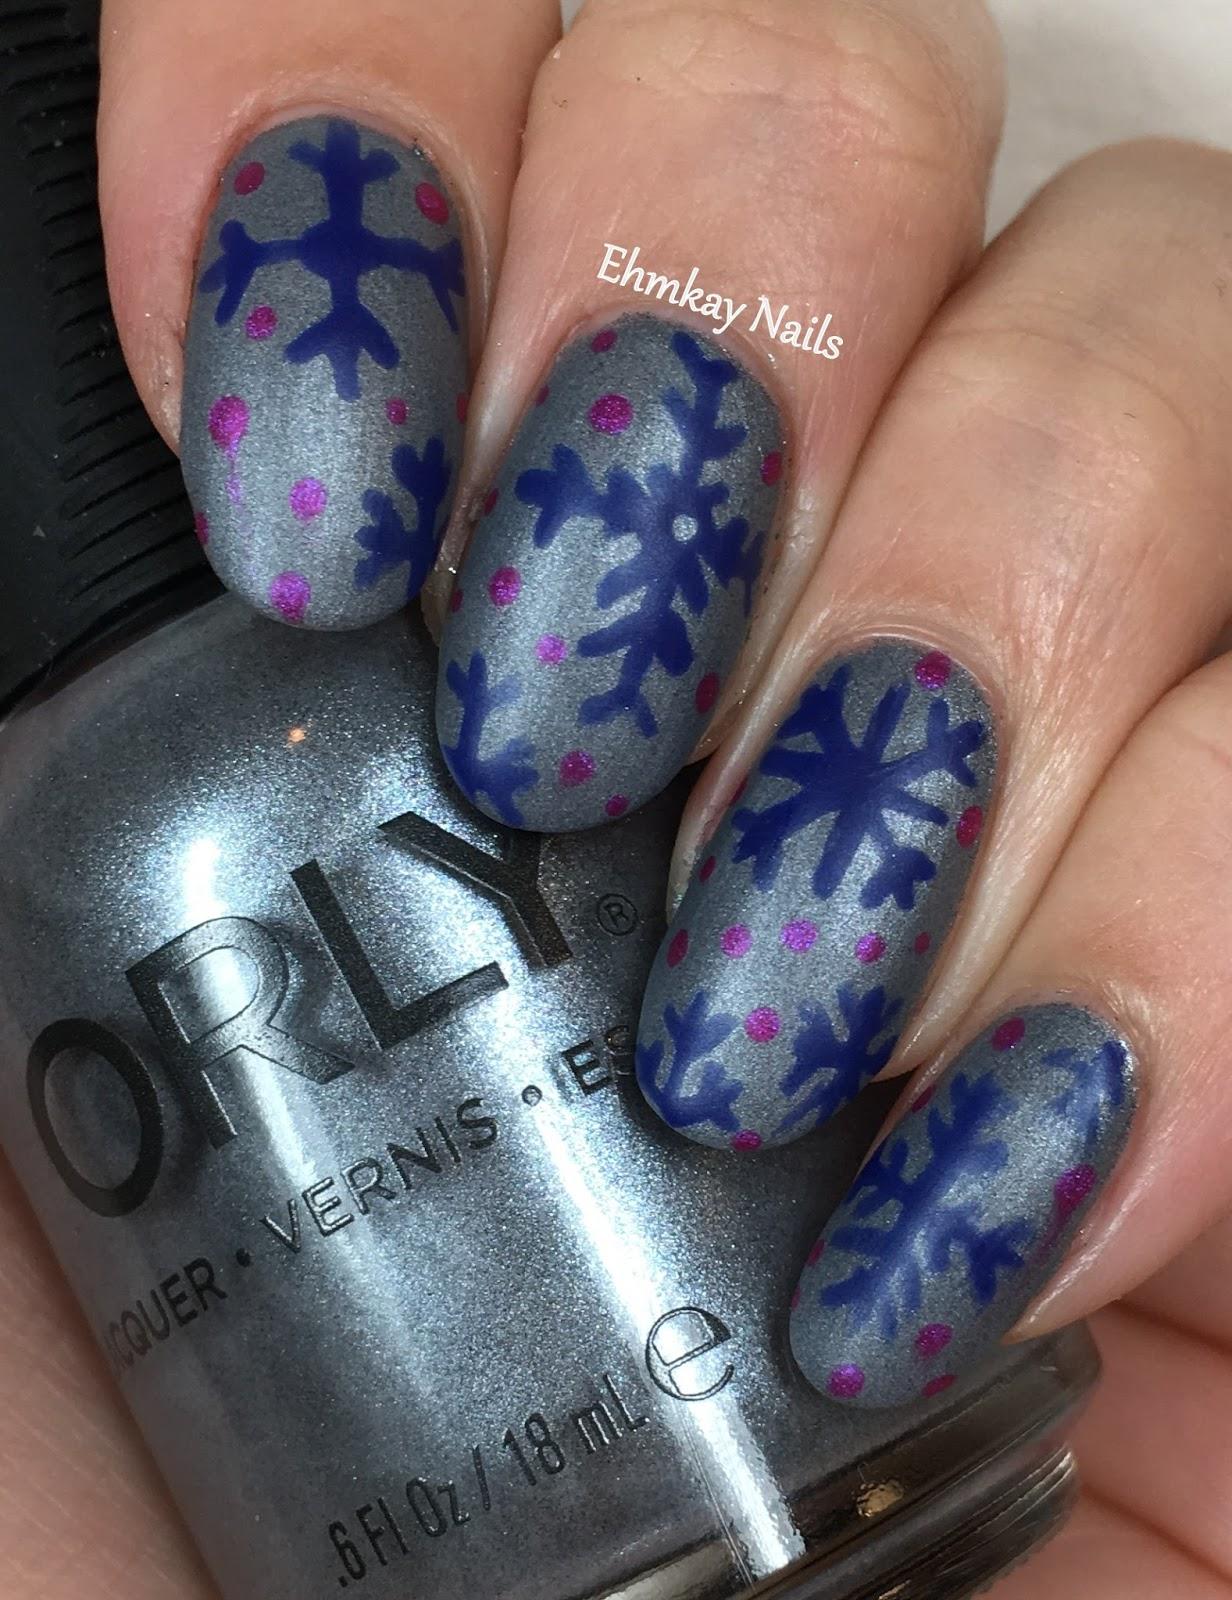 Ehmkay Nails Shy Bunny Easter Nail Art: Ehmkay Nails: Orly Sunset Strip Holiday 2016 Snowflakes